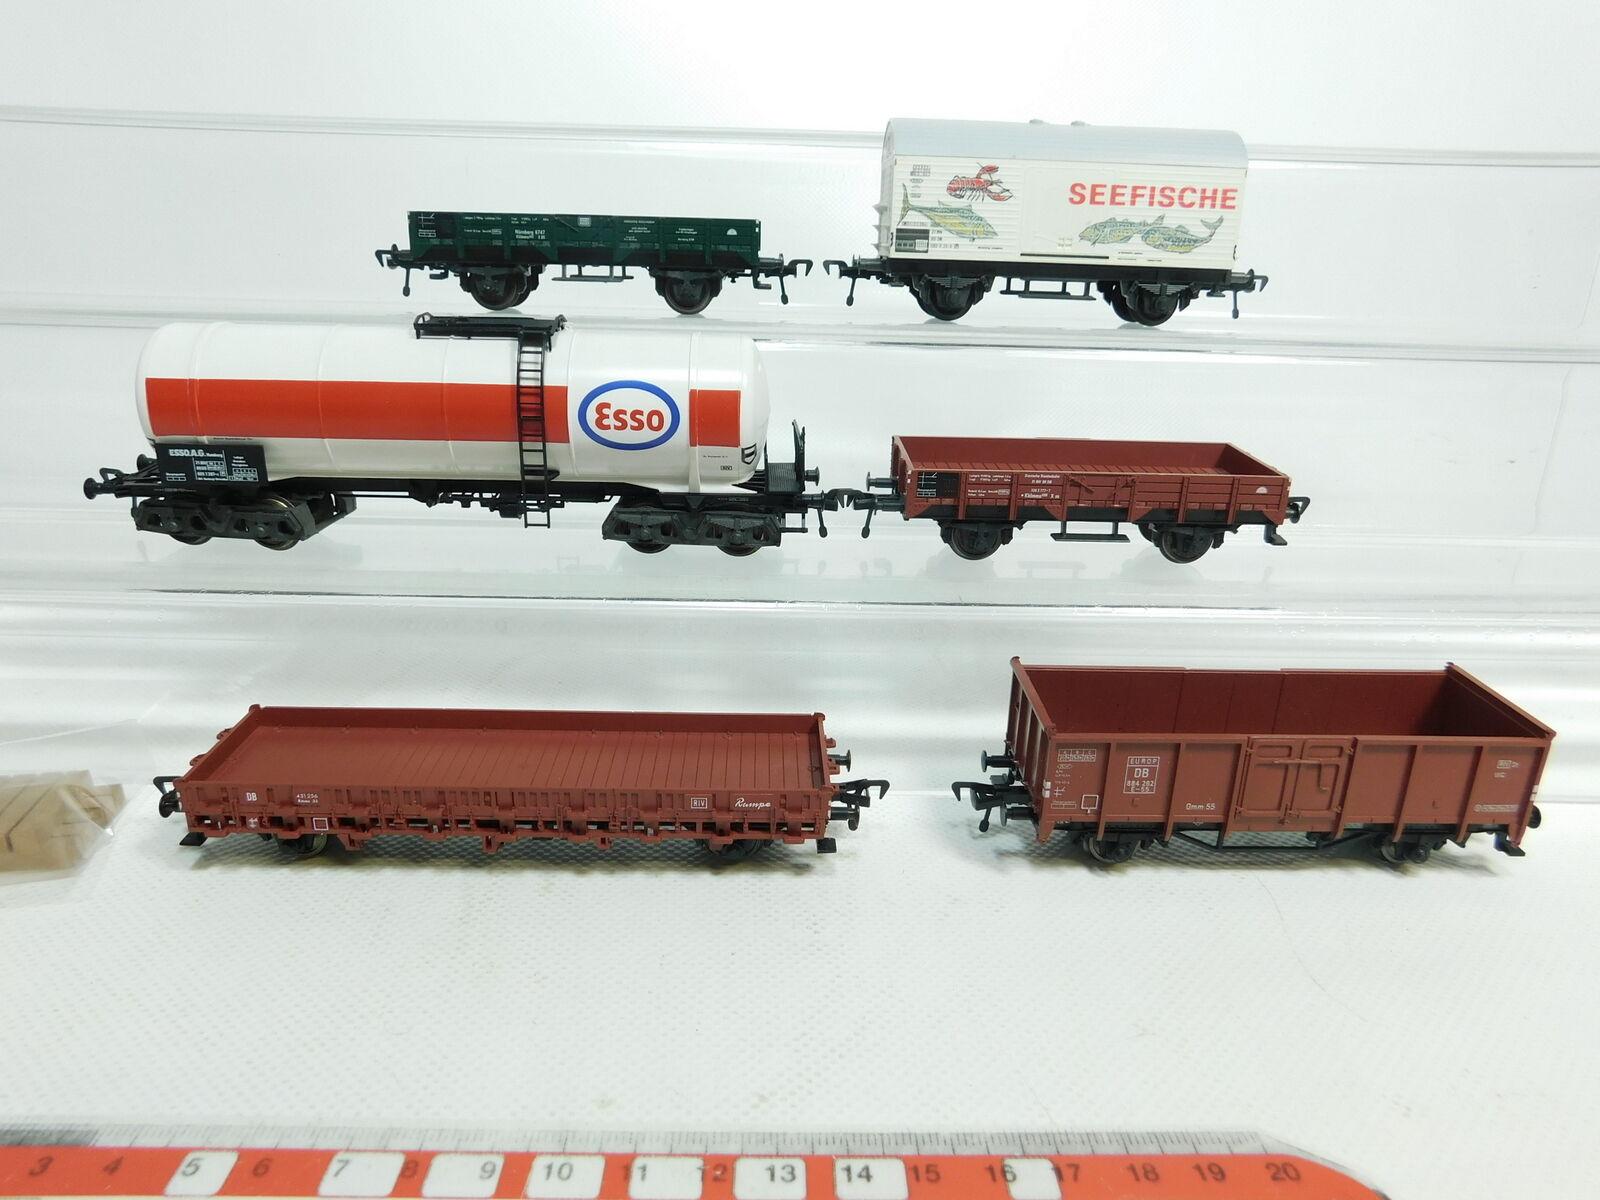 Bi531-1 6x FLEISCHMANN H0/DC CARRO MERCI DB PESCI MARINI + Esso + kran-beiwagen